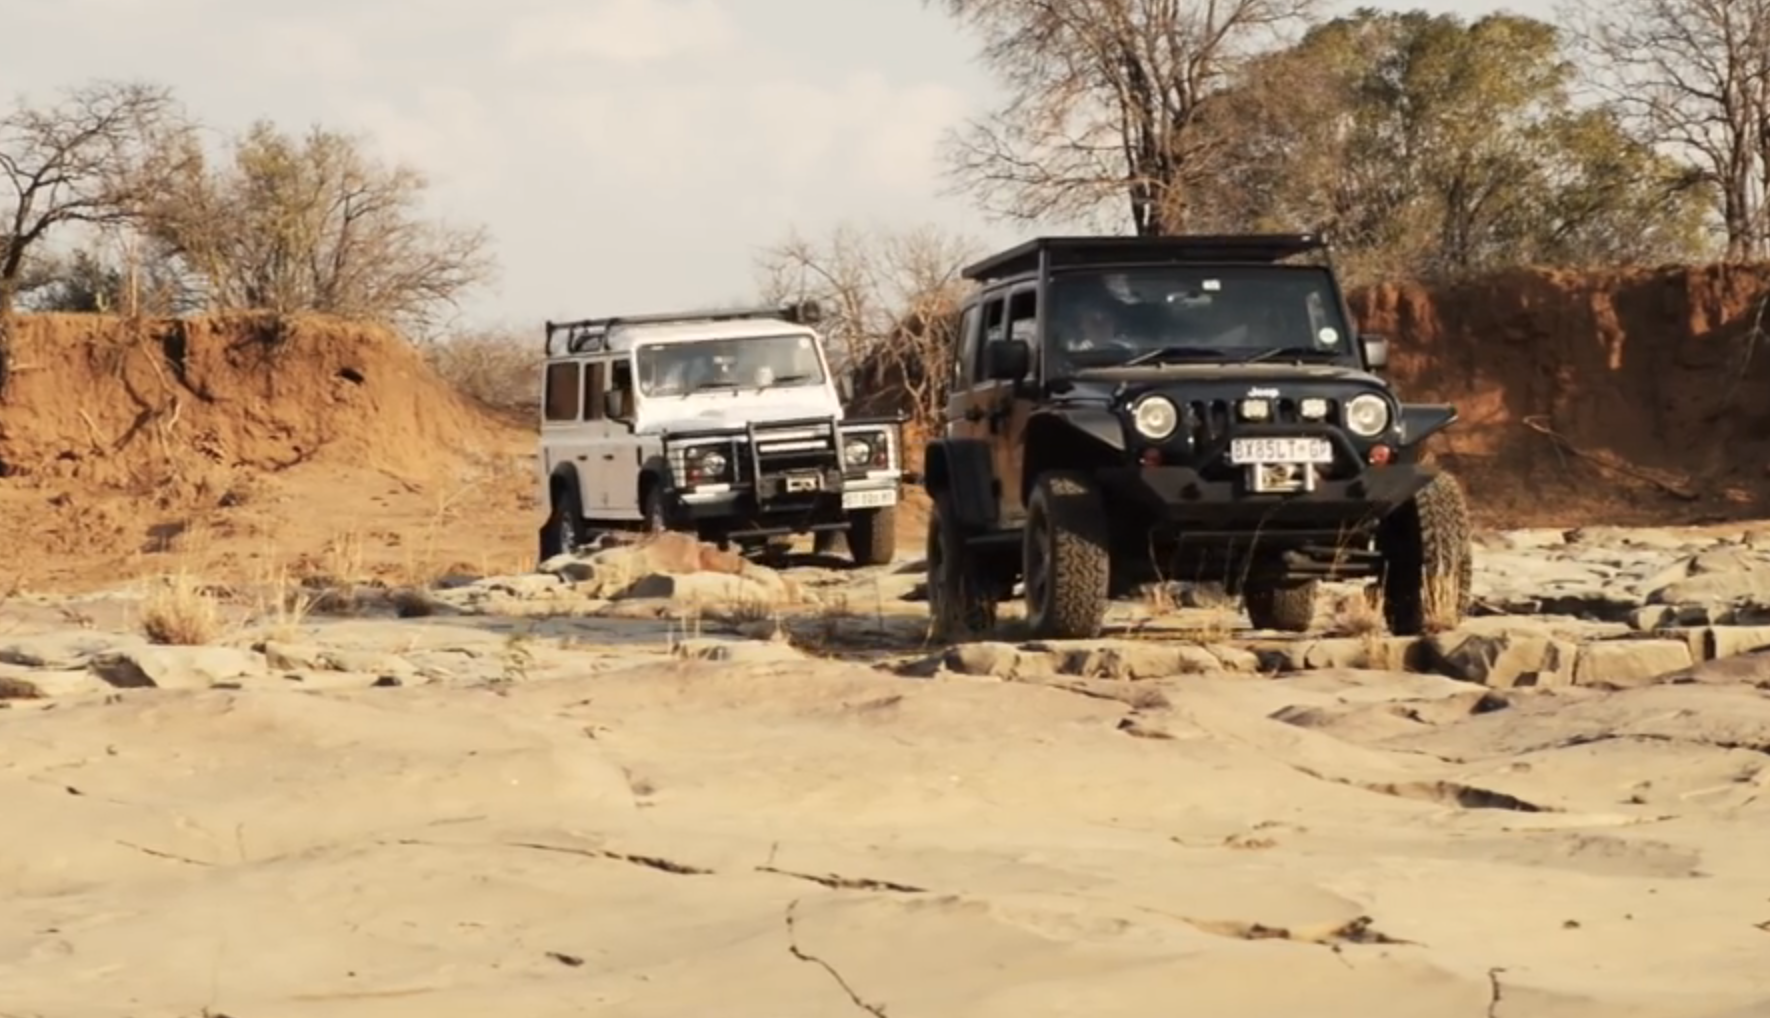 4xoverland Land Rover Defender Vs Jeep Wrangler Land Rover